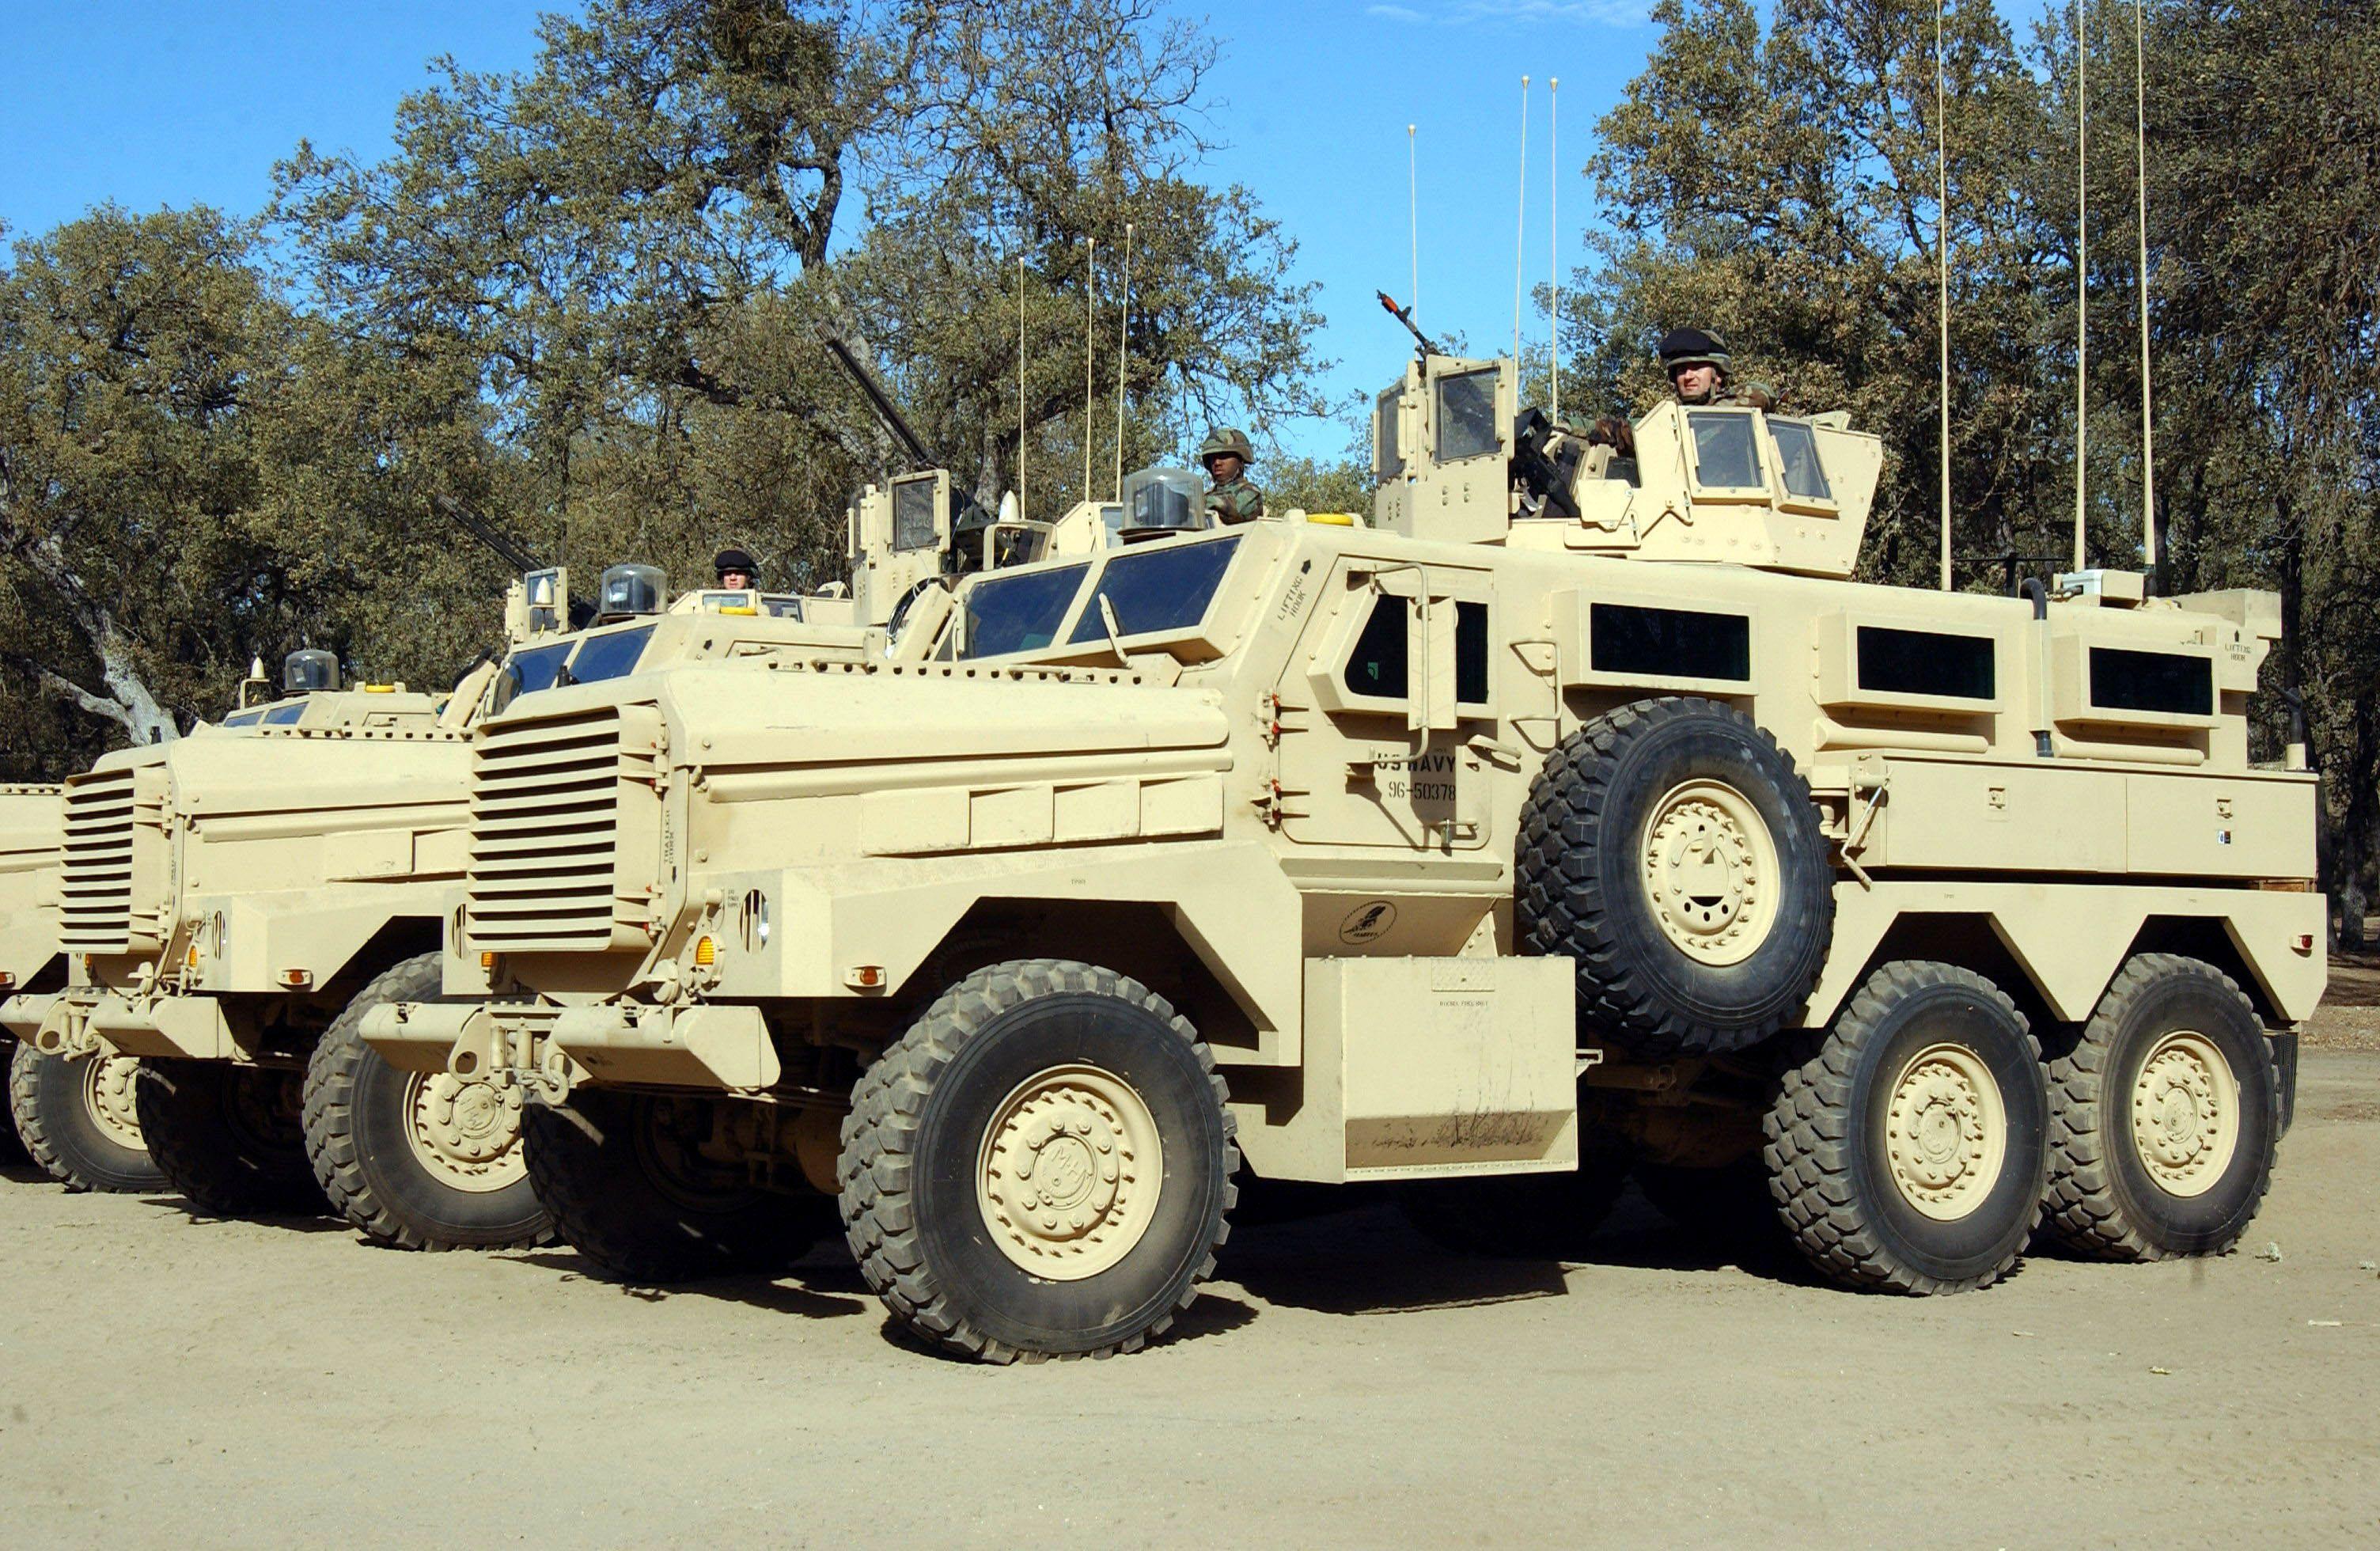 Cougar 6x6 Mine-Resistant Ambush Protected Vehicle (USA) | military ...